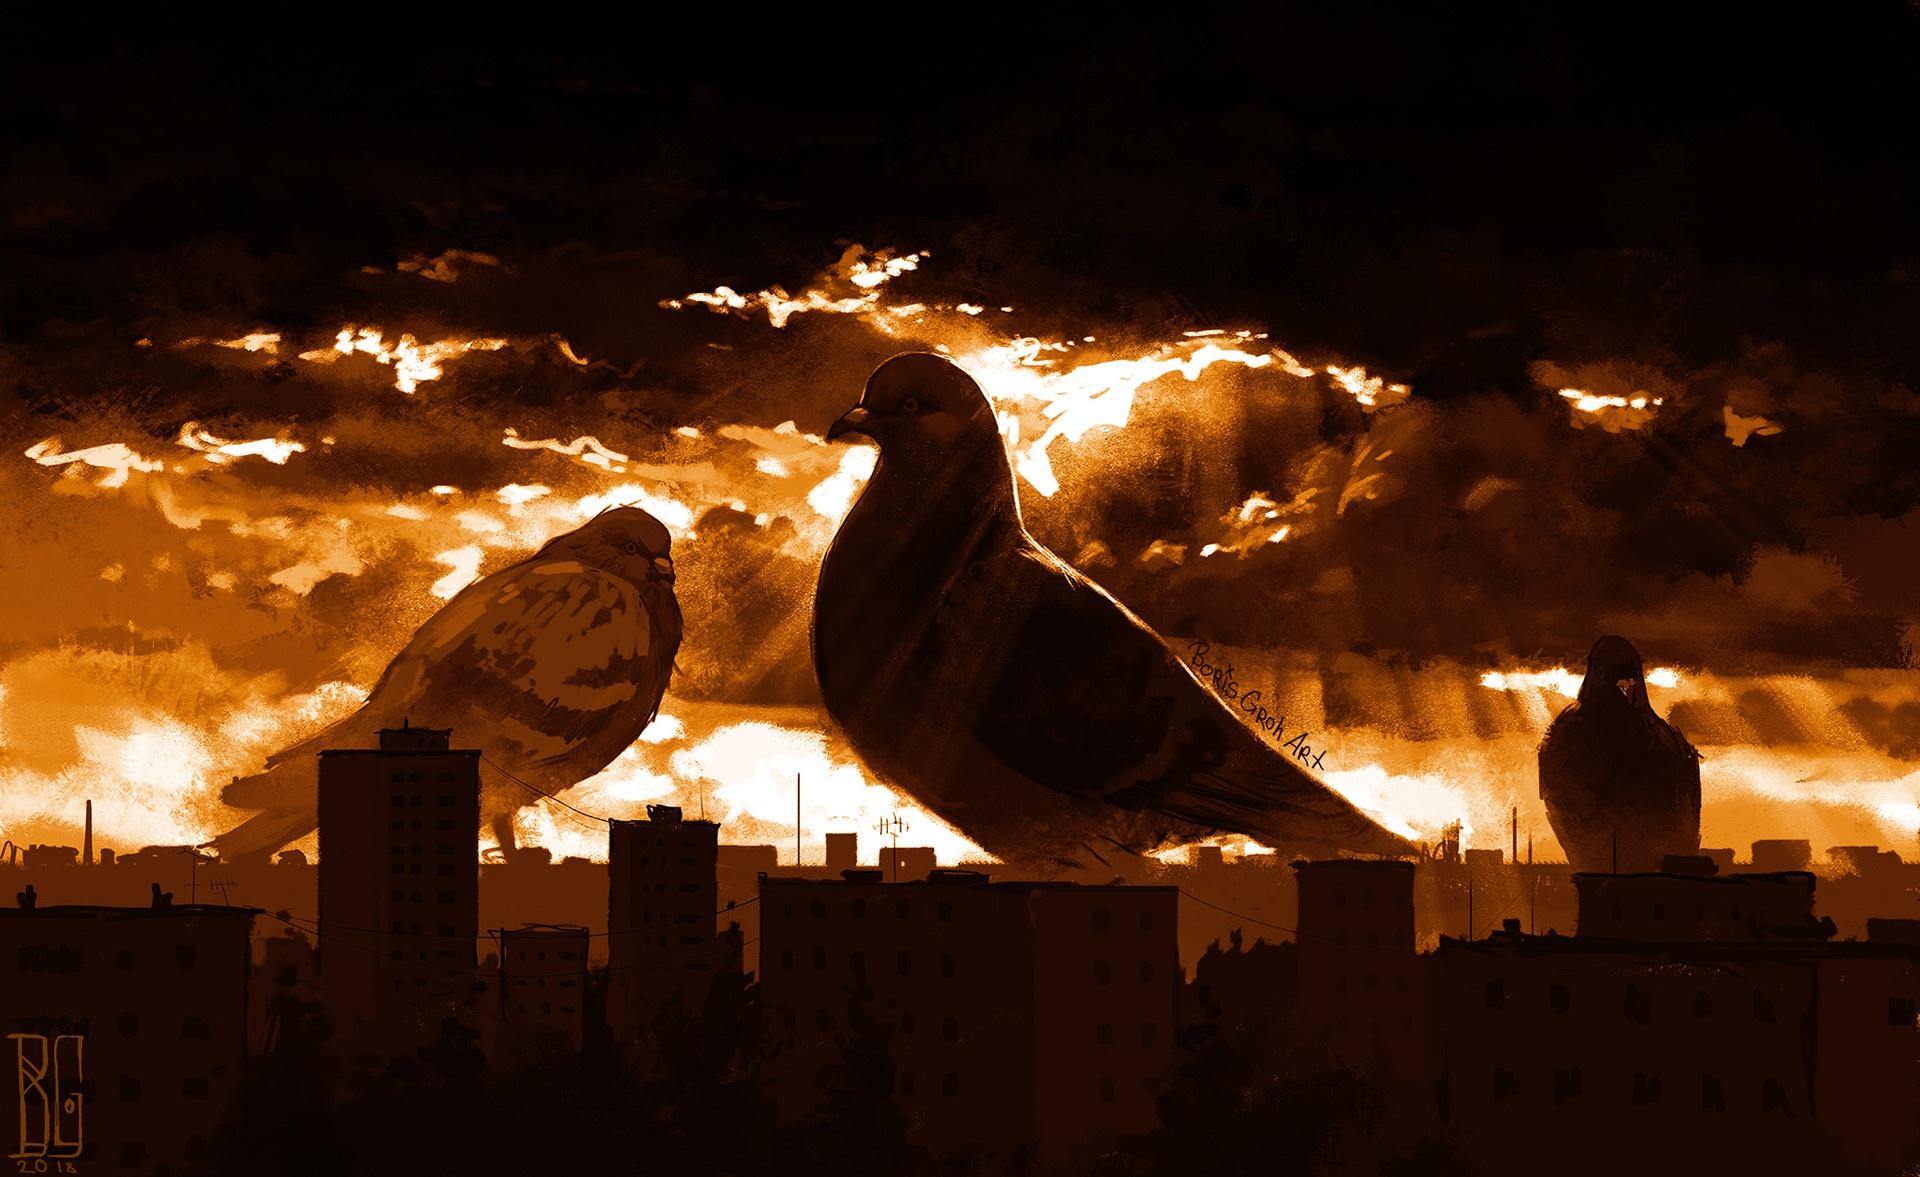 General 1920x1177 dark sky cityscape artwork Boris Groh pigeons